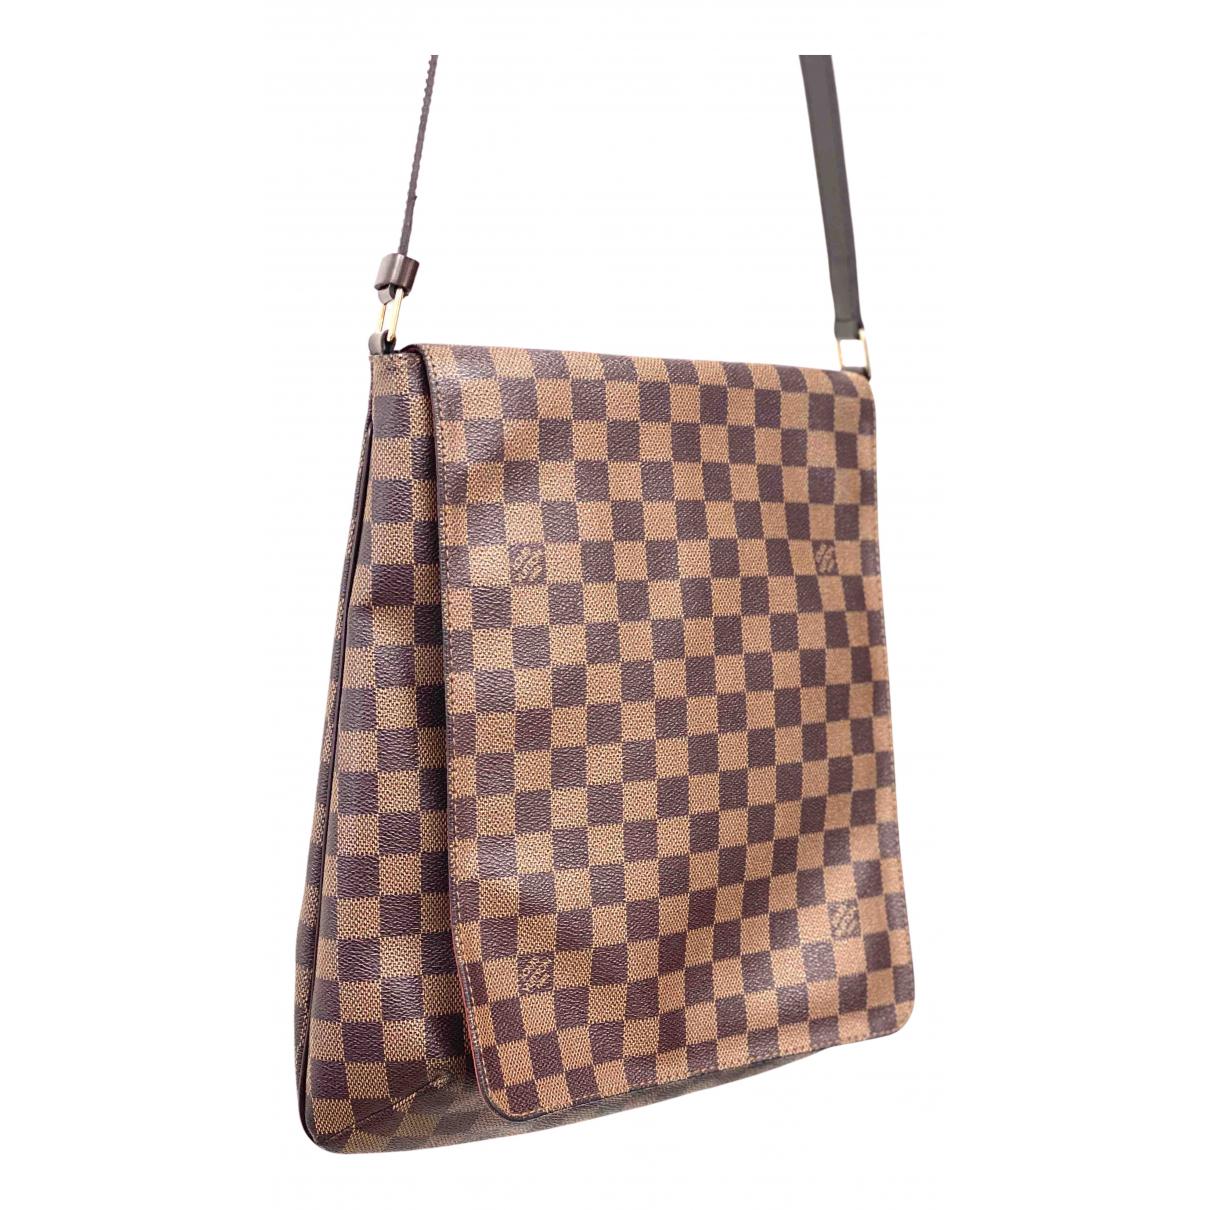 Bandolera Musette de Lona Louis Vuitton